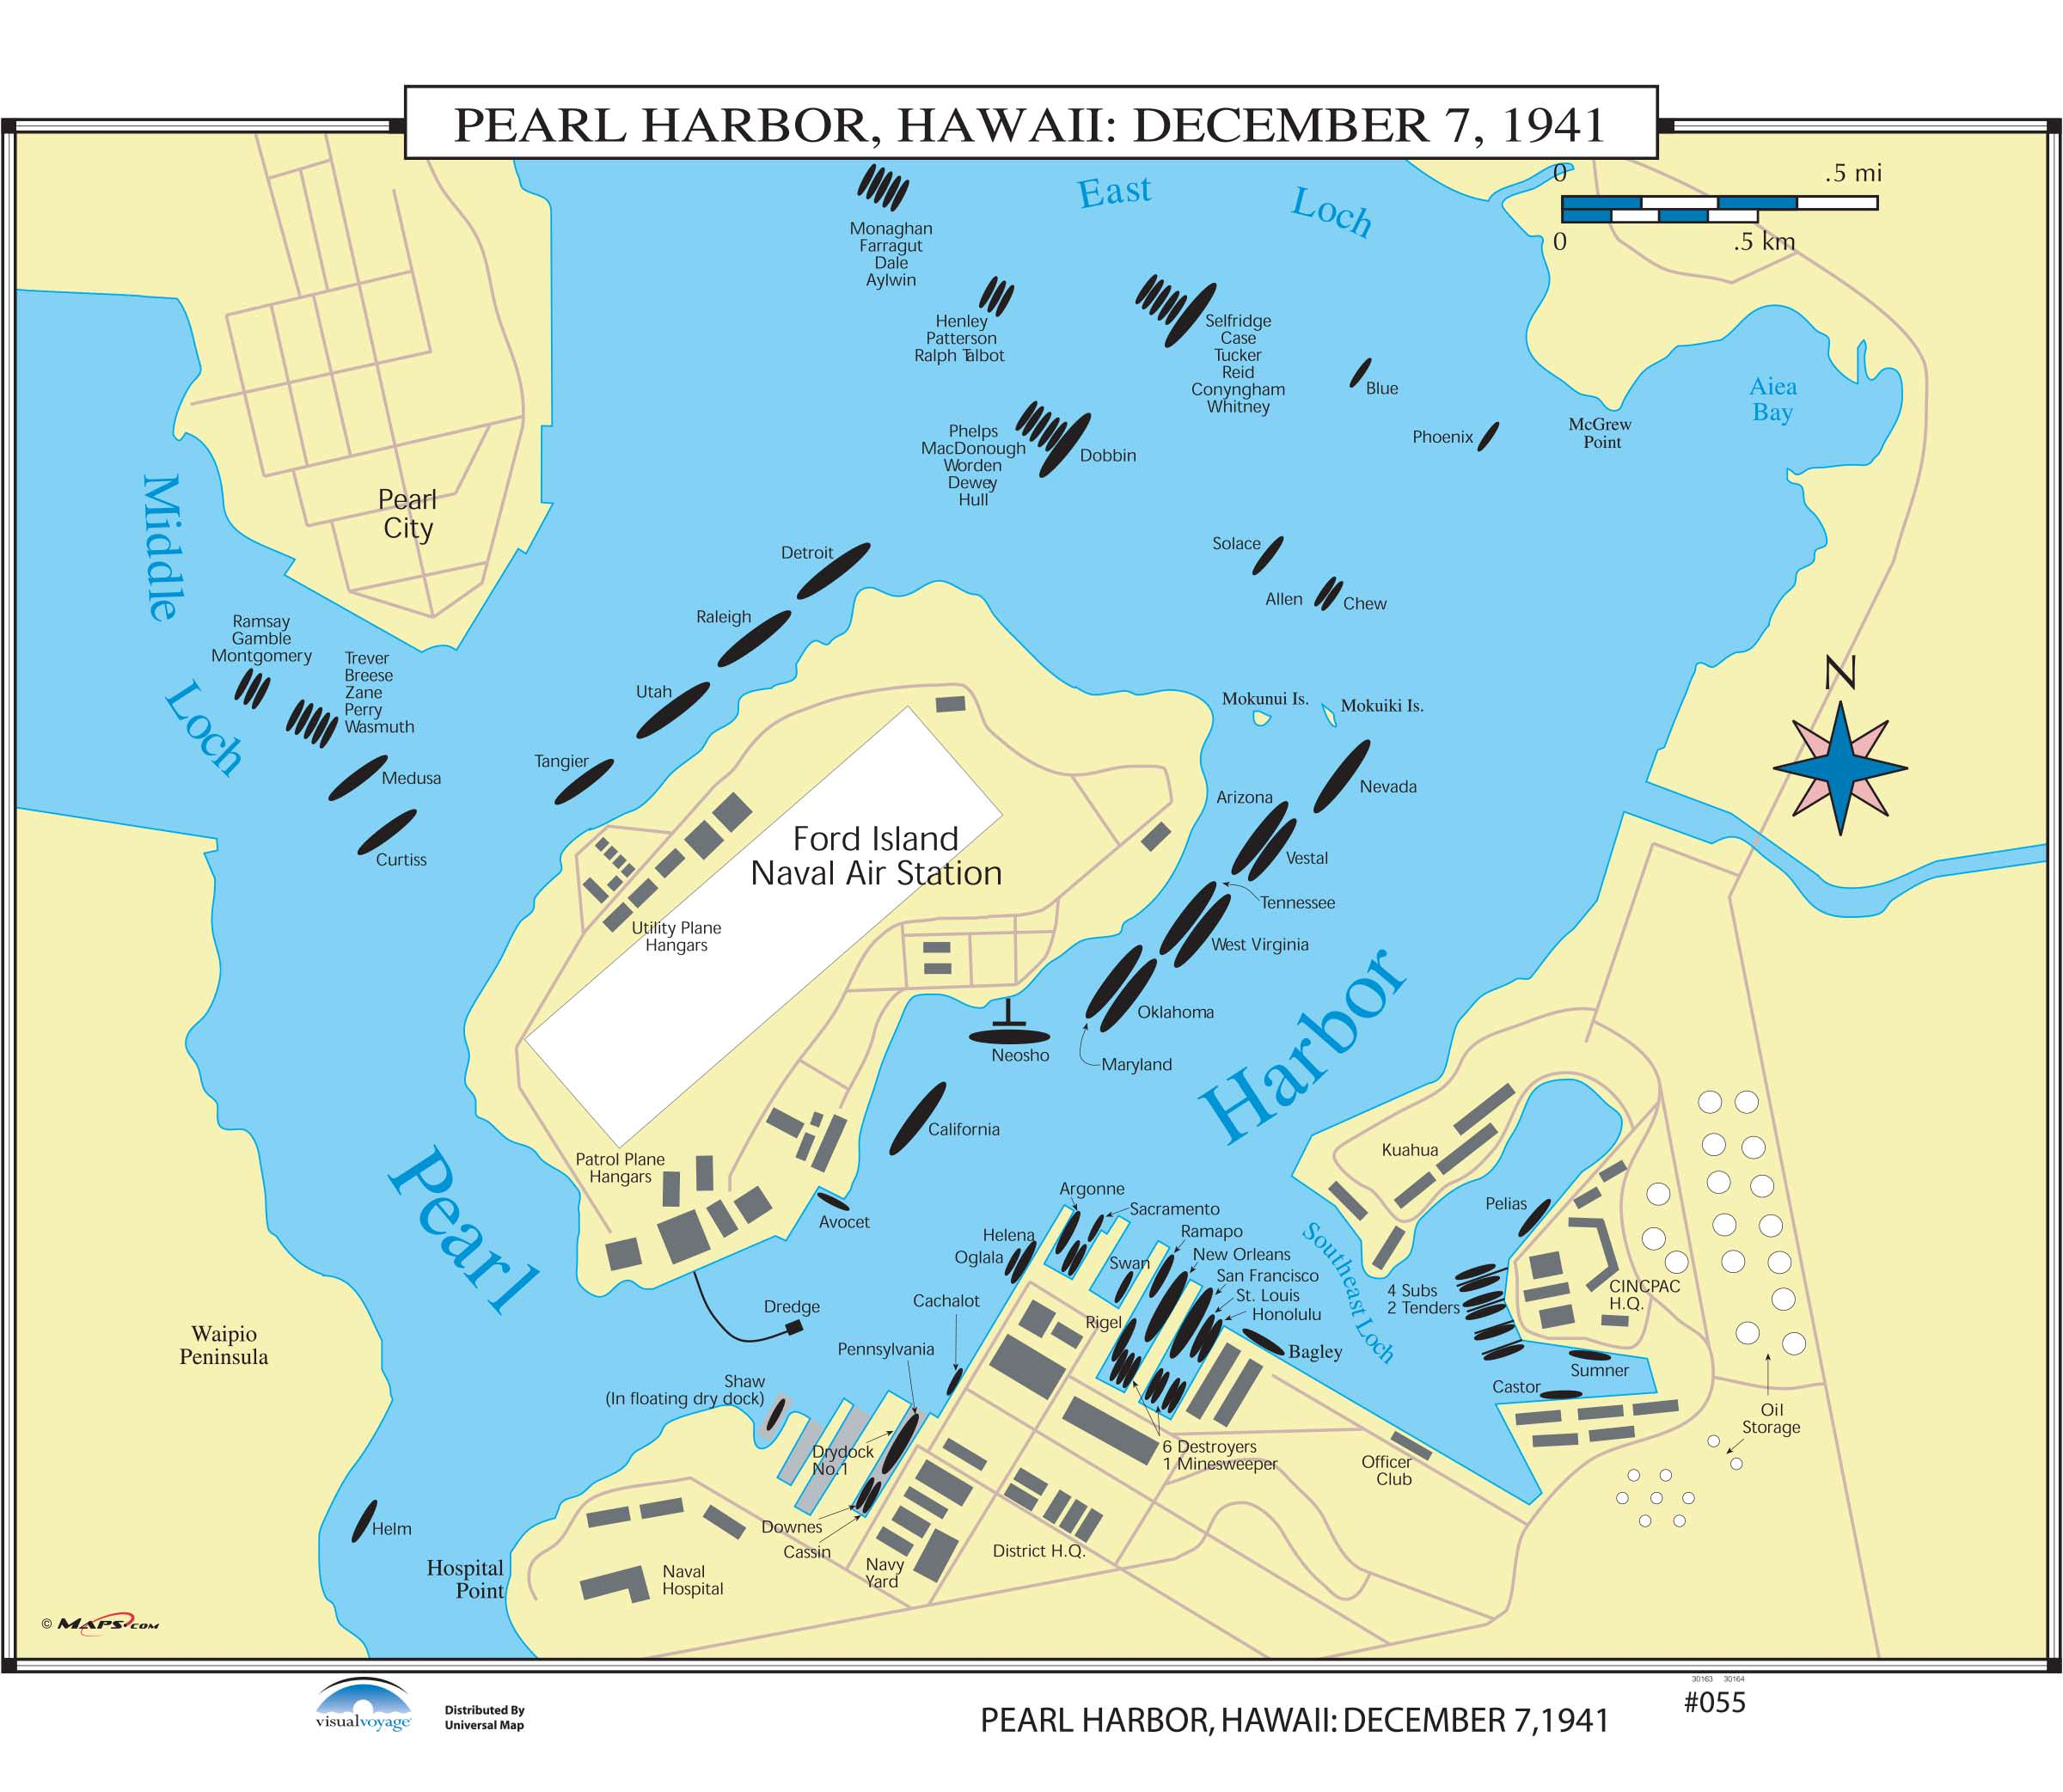 055 Pearl Harbor Hawaii December 7 Kappa Map Group